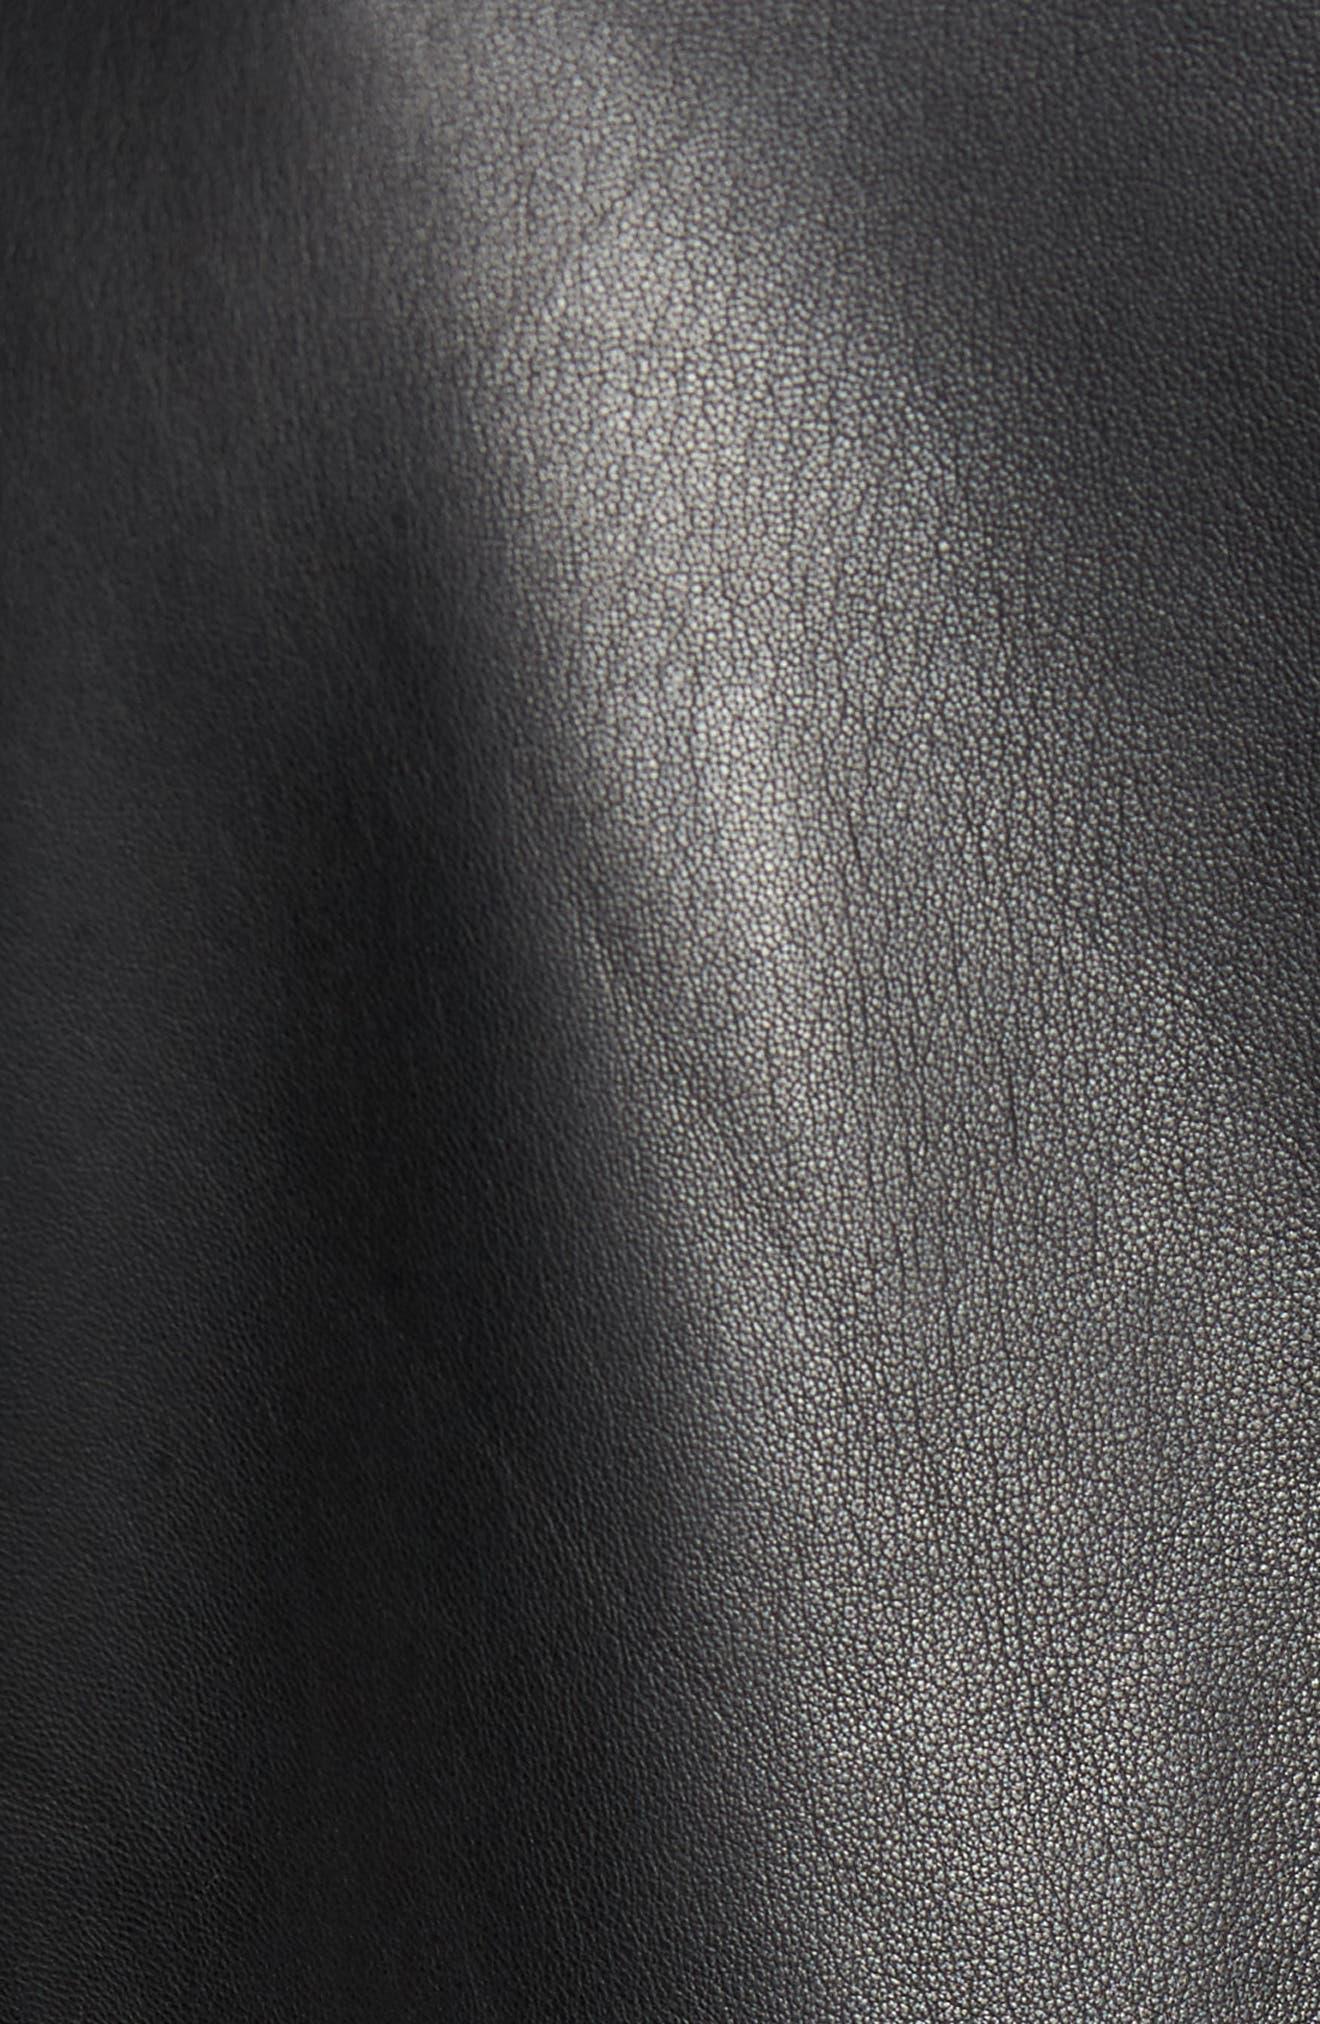 Bonded Leather Jacket,                             Alternate thumbnail 5, color,                             Black